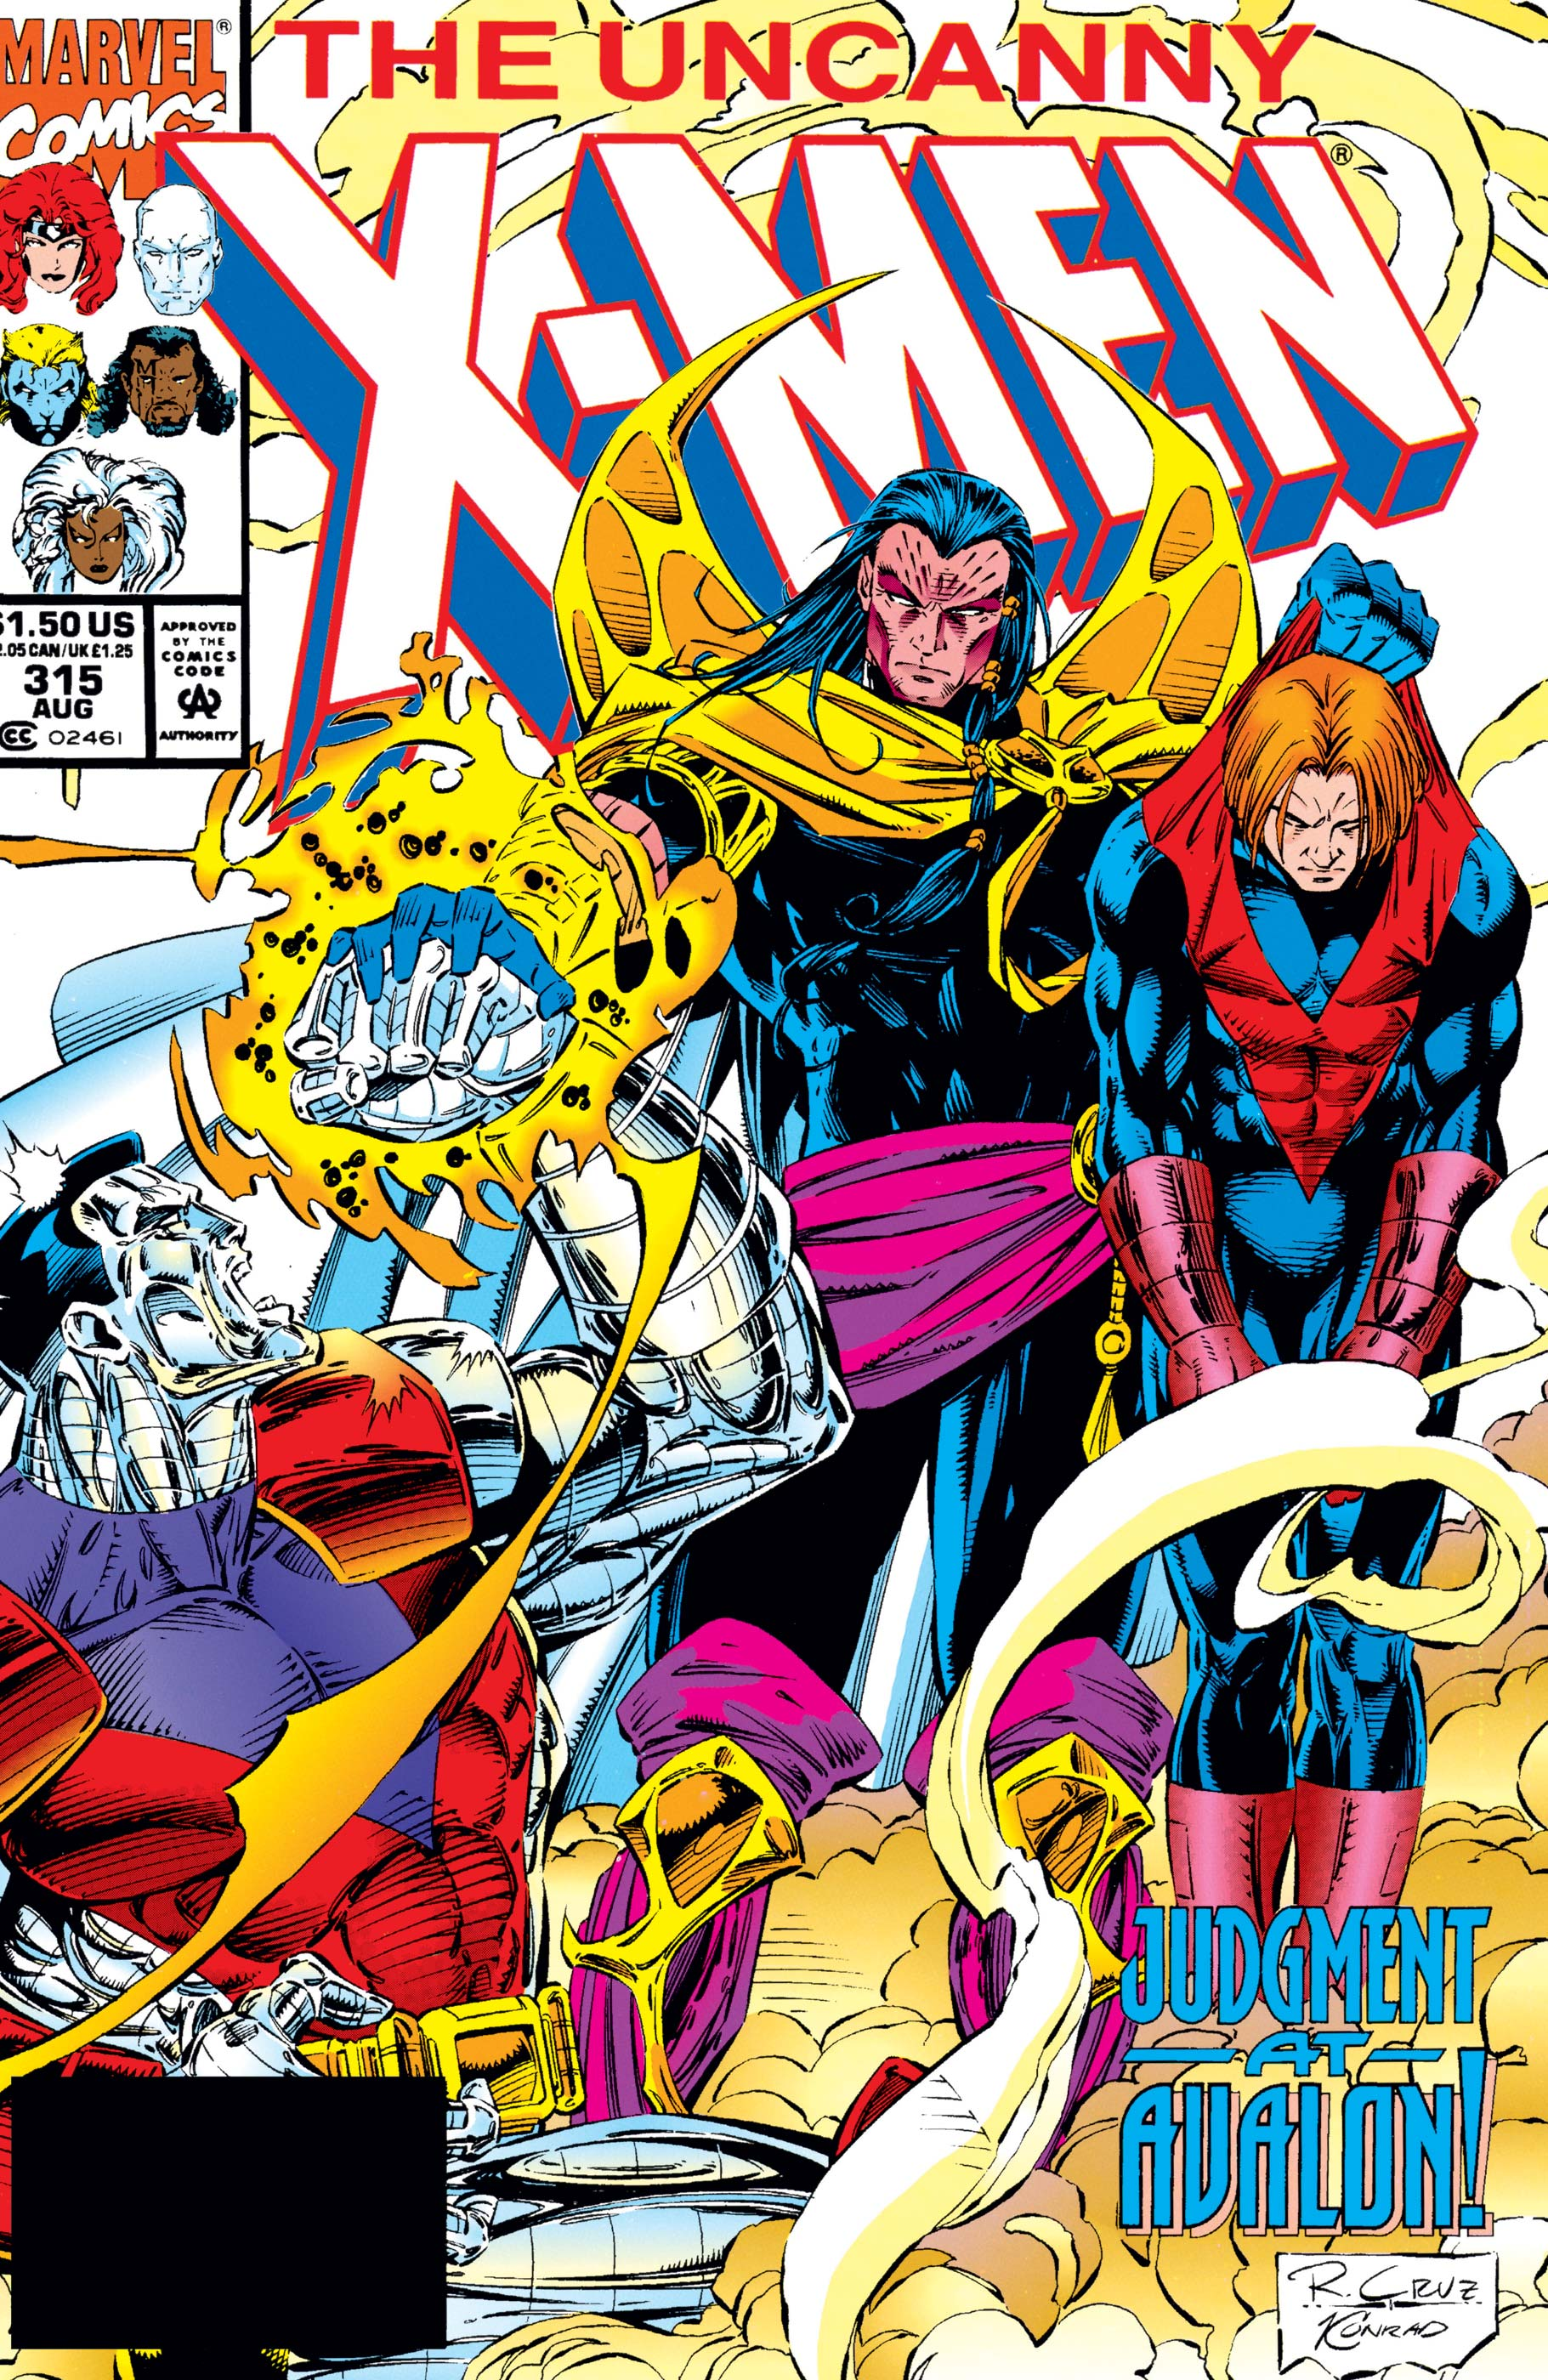 Uncanny X-Men (1963) #315